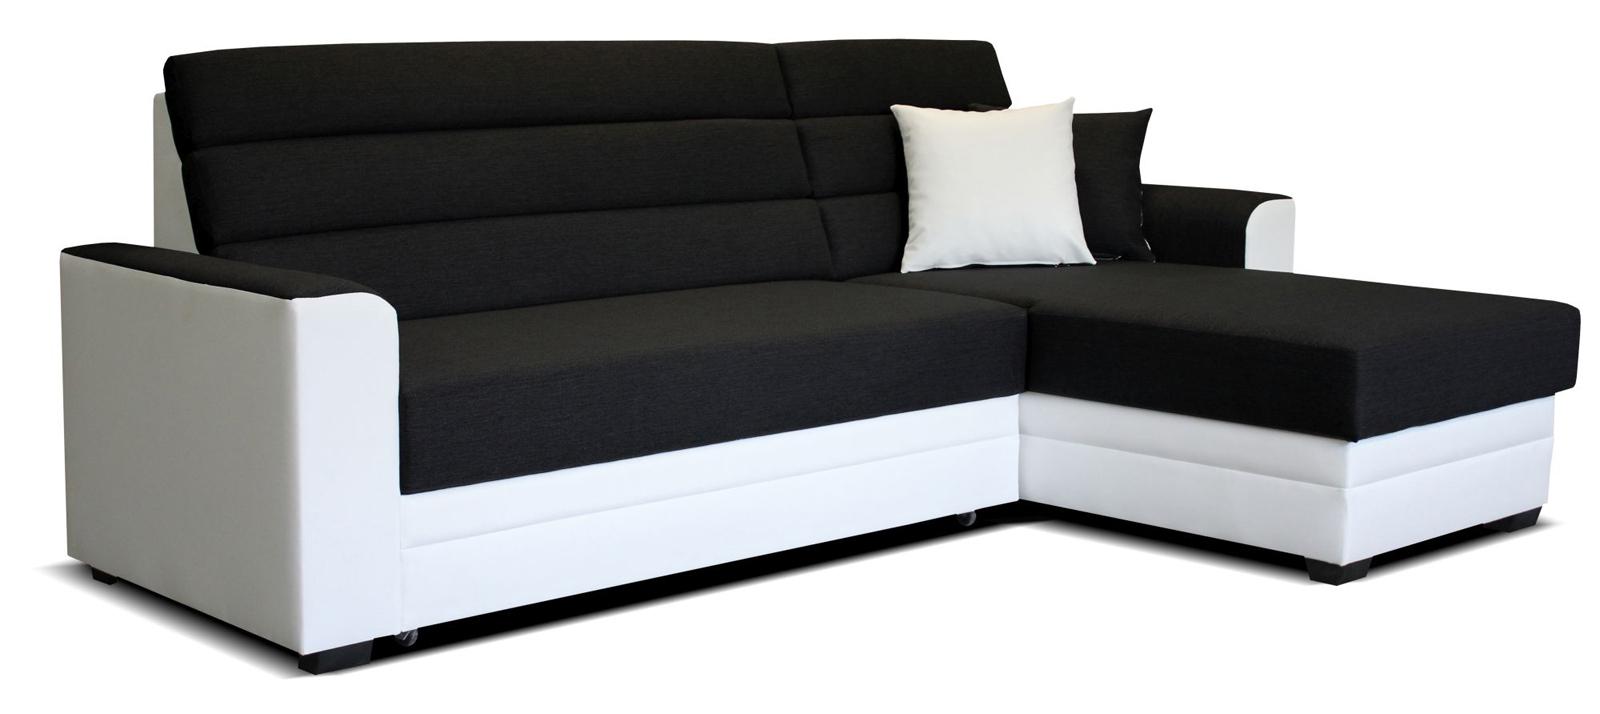 Rohová sedací souprava - Po-Sed - Ulm 2F+L (černá + bílá) (P)